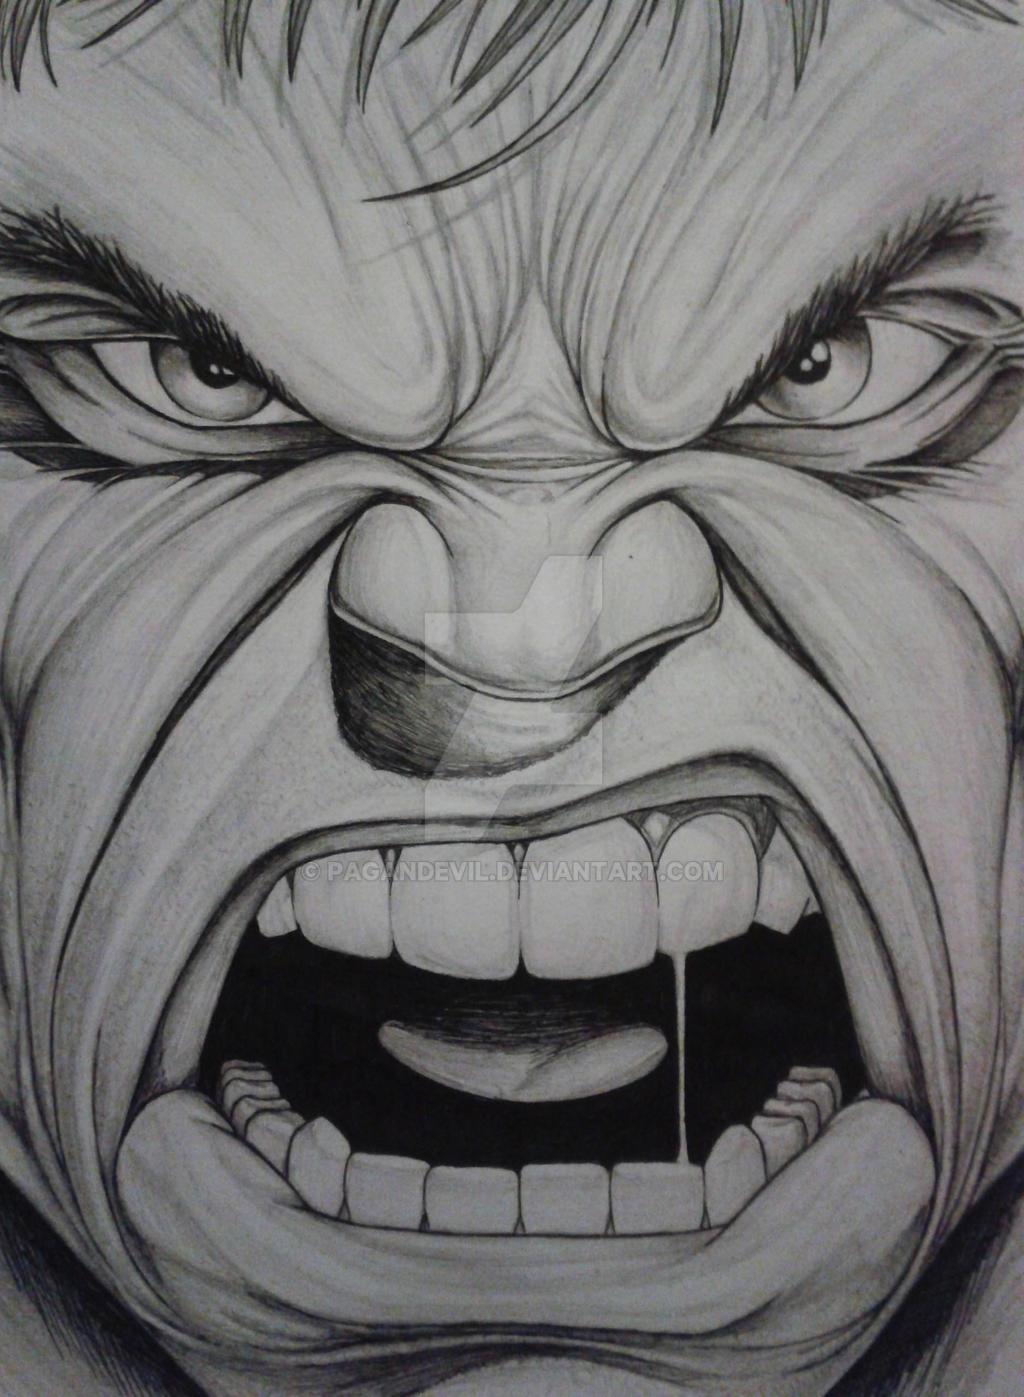 Hulk Sketch 01 By Pagandevil On DeviantArt